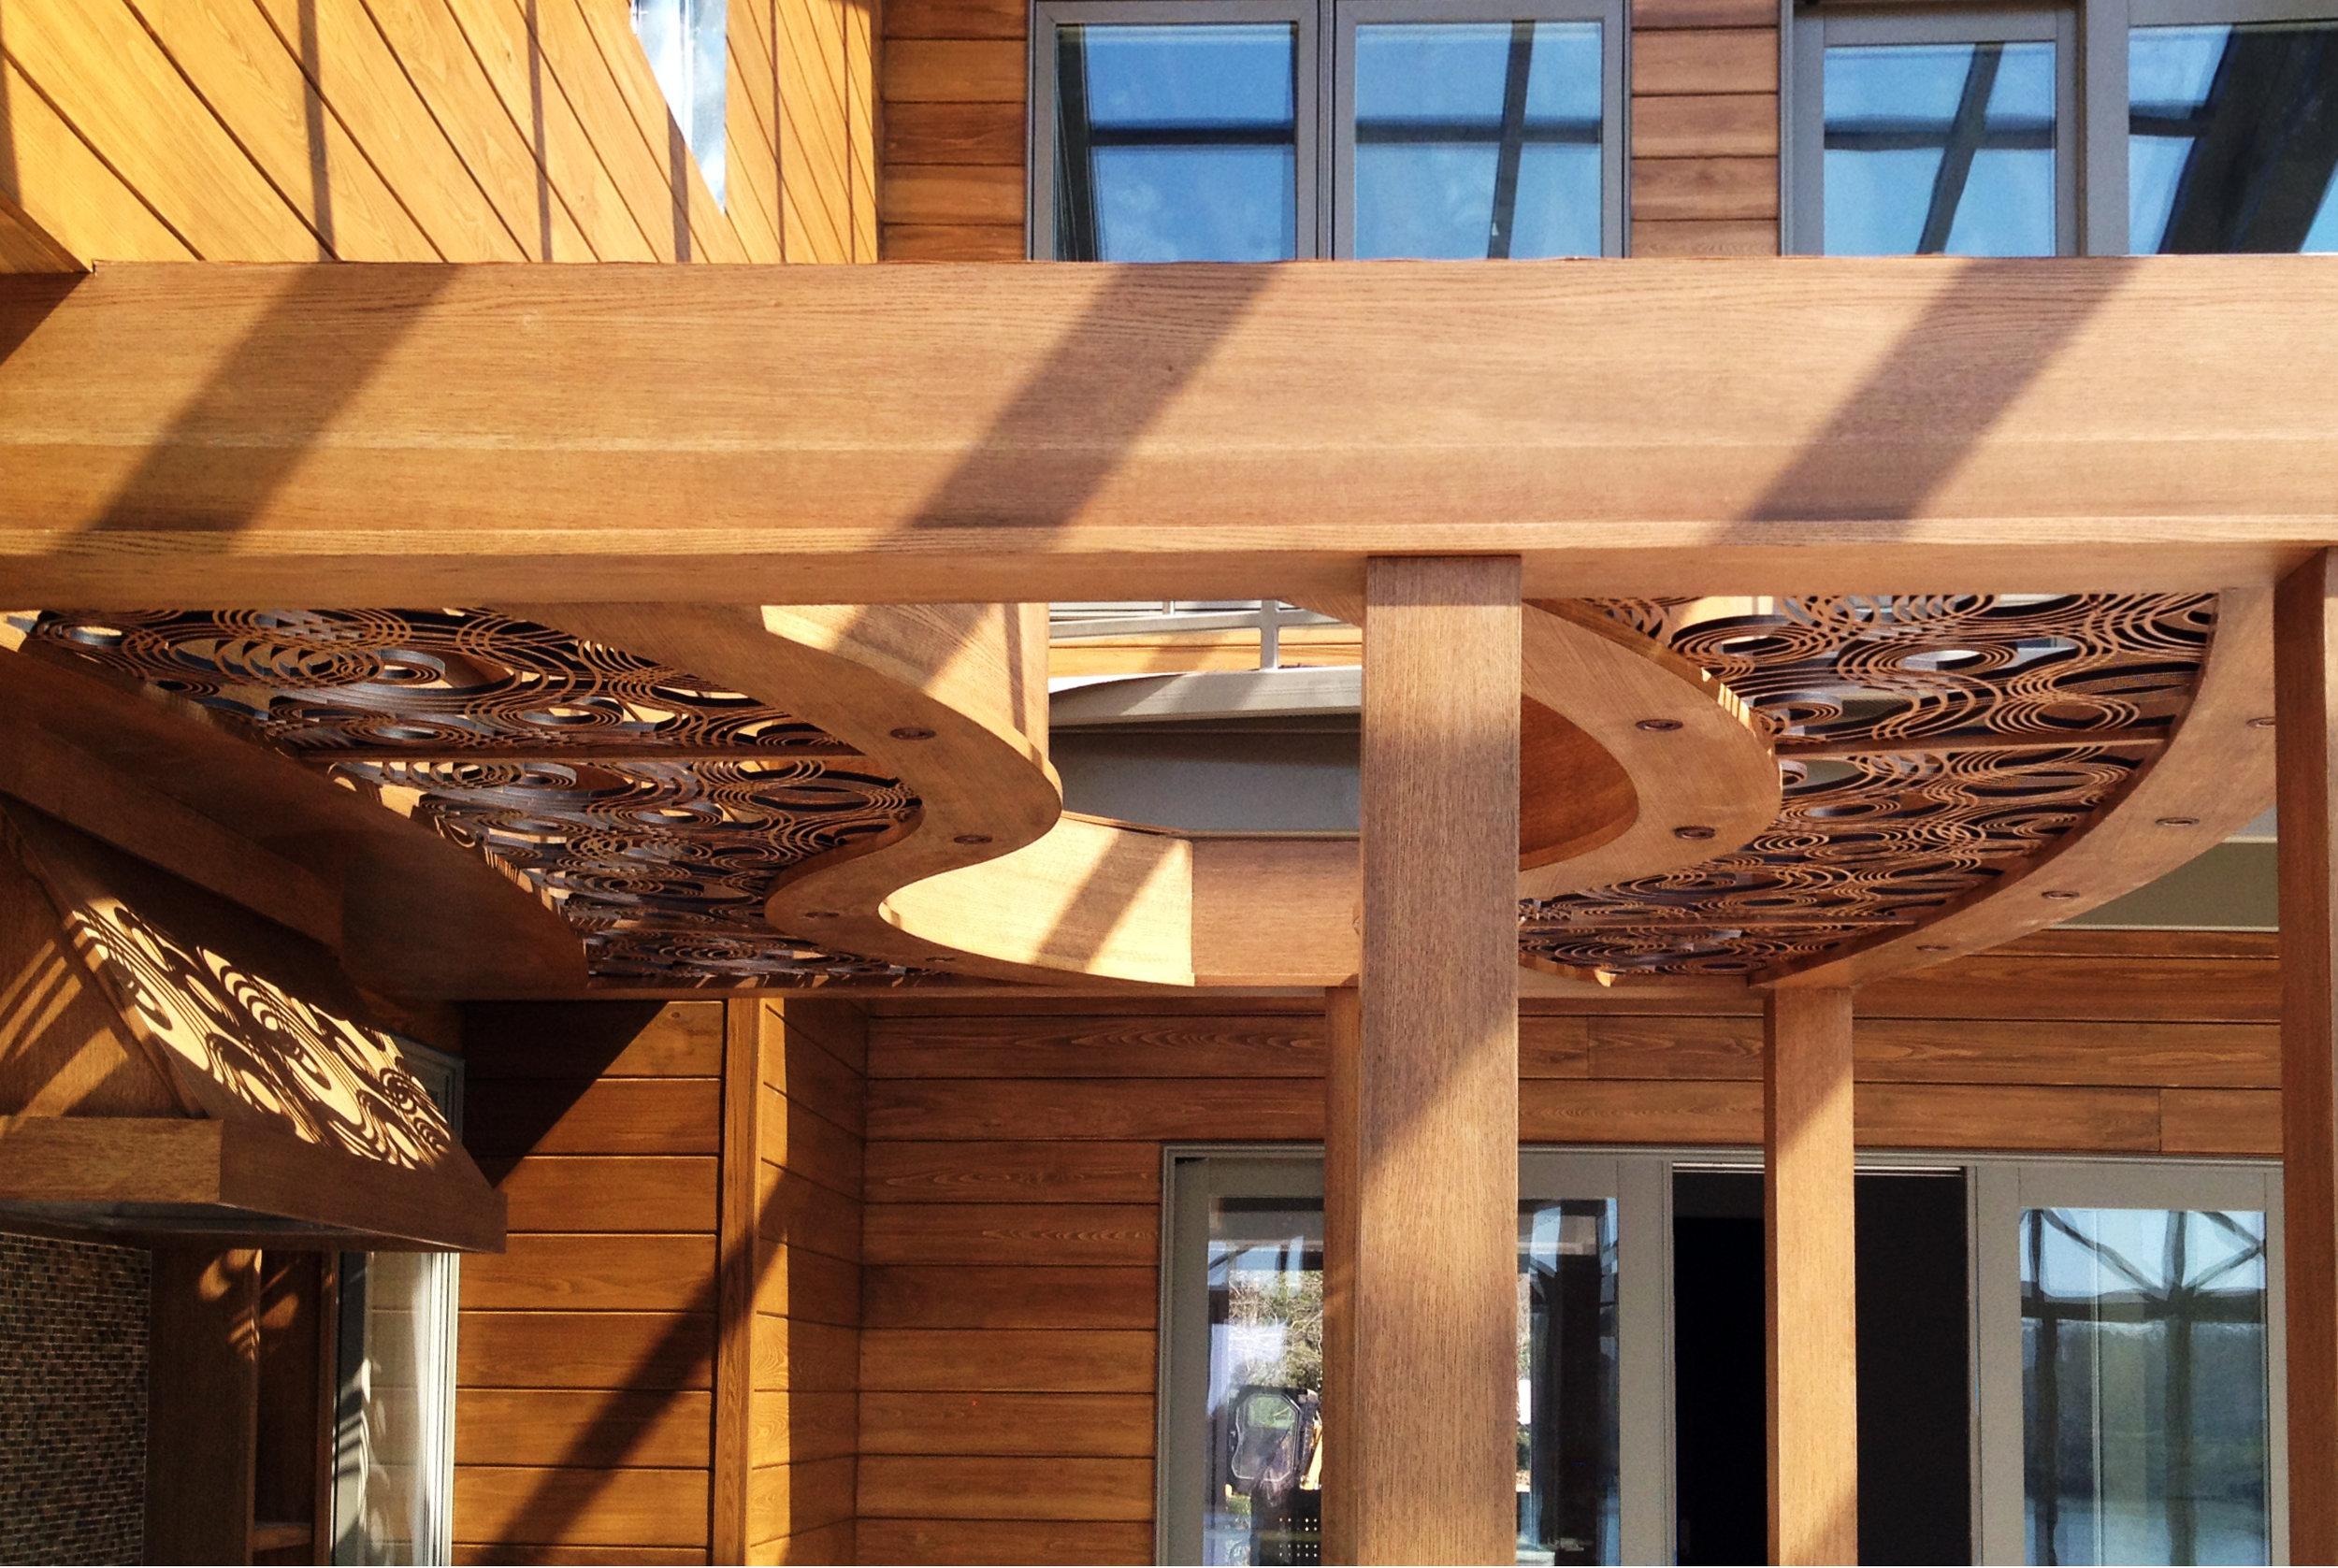 Residence, Irvington, VA -  Ruffino Cabinetry/Terri Wesselman, ASID - OMNI Design  Rain on Water, Decorative outdoor panels